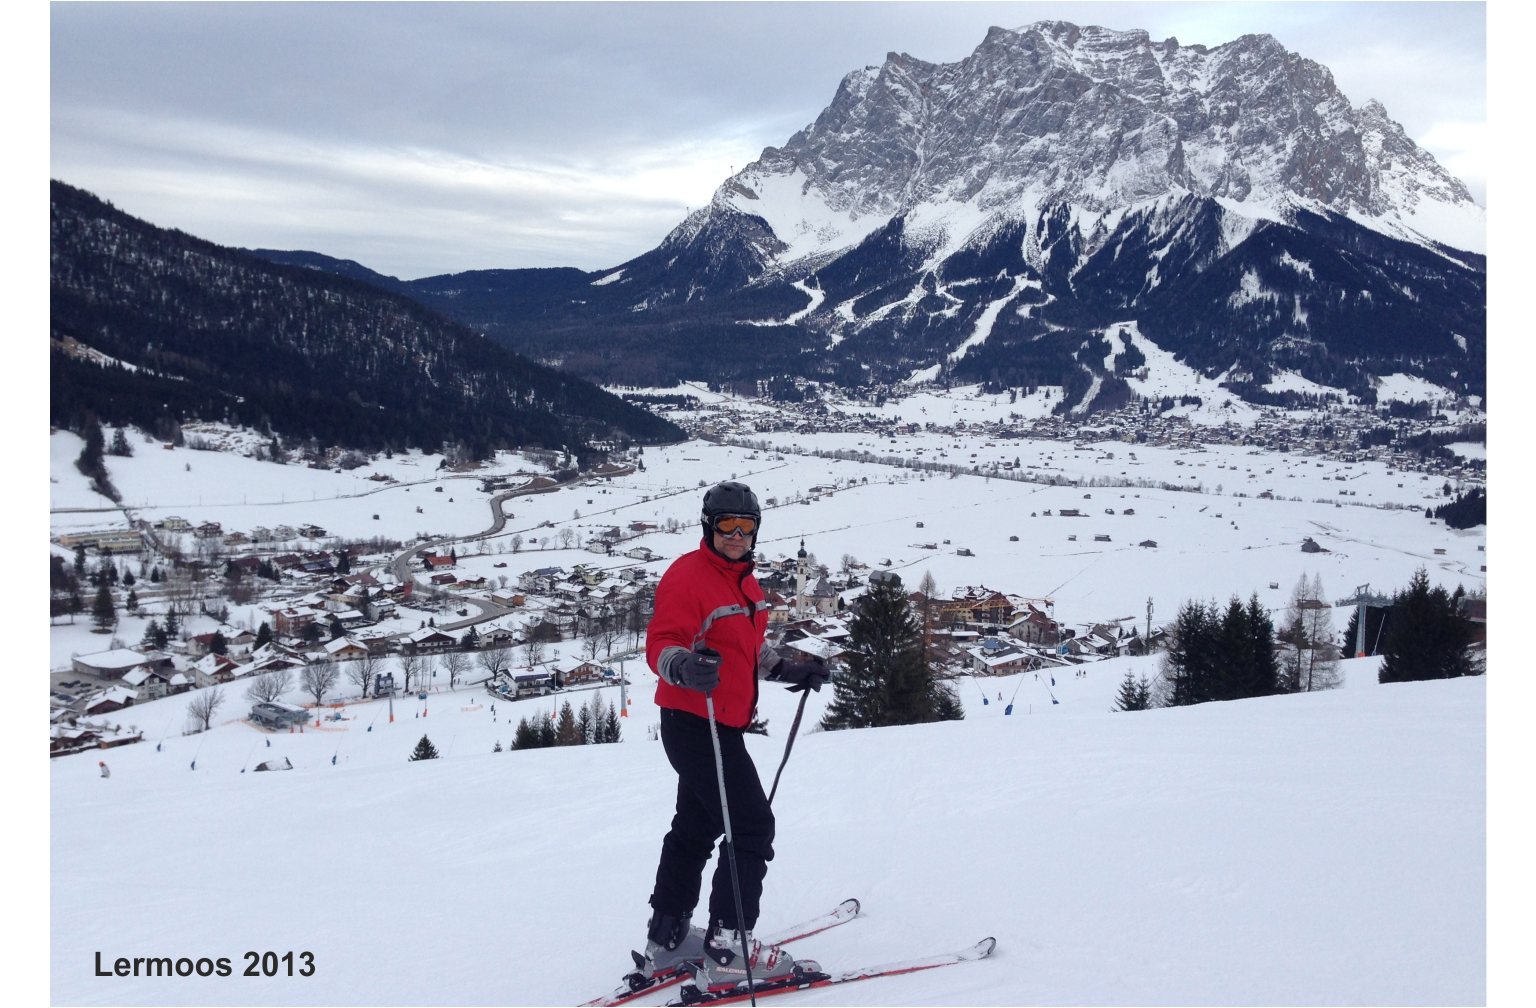 Ski Urlaub Lermoos 2013